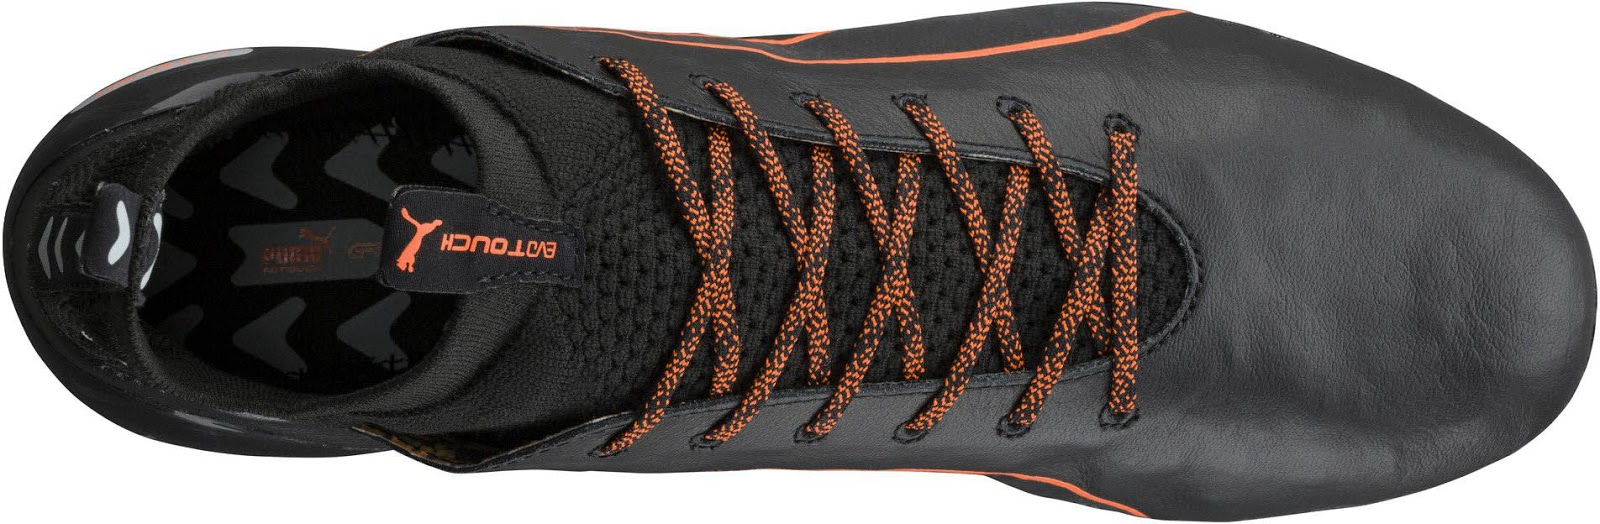 black-orange-puma-evotouch-2016-17-boots overhead